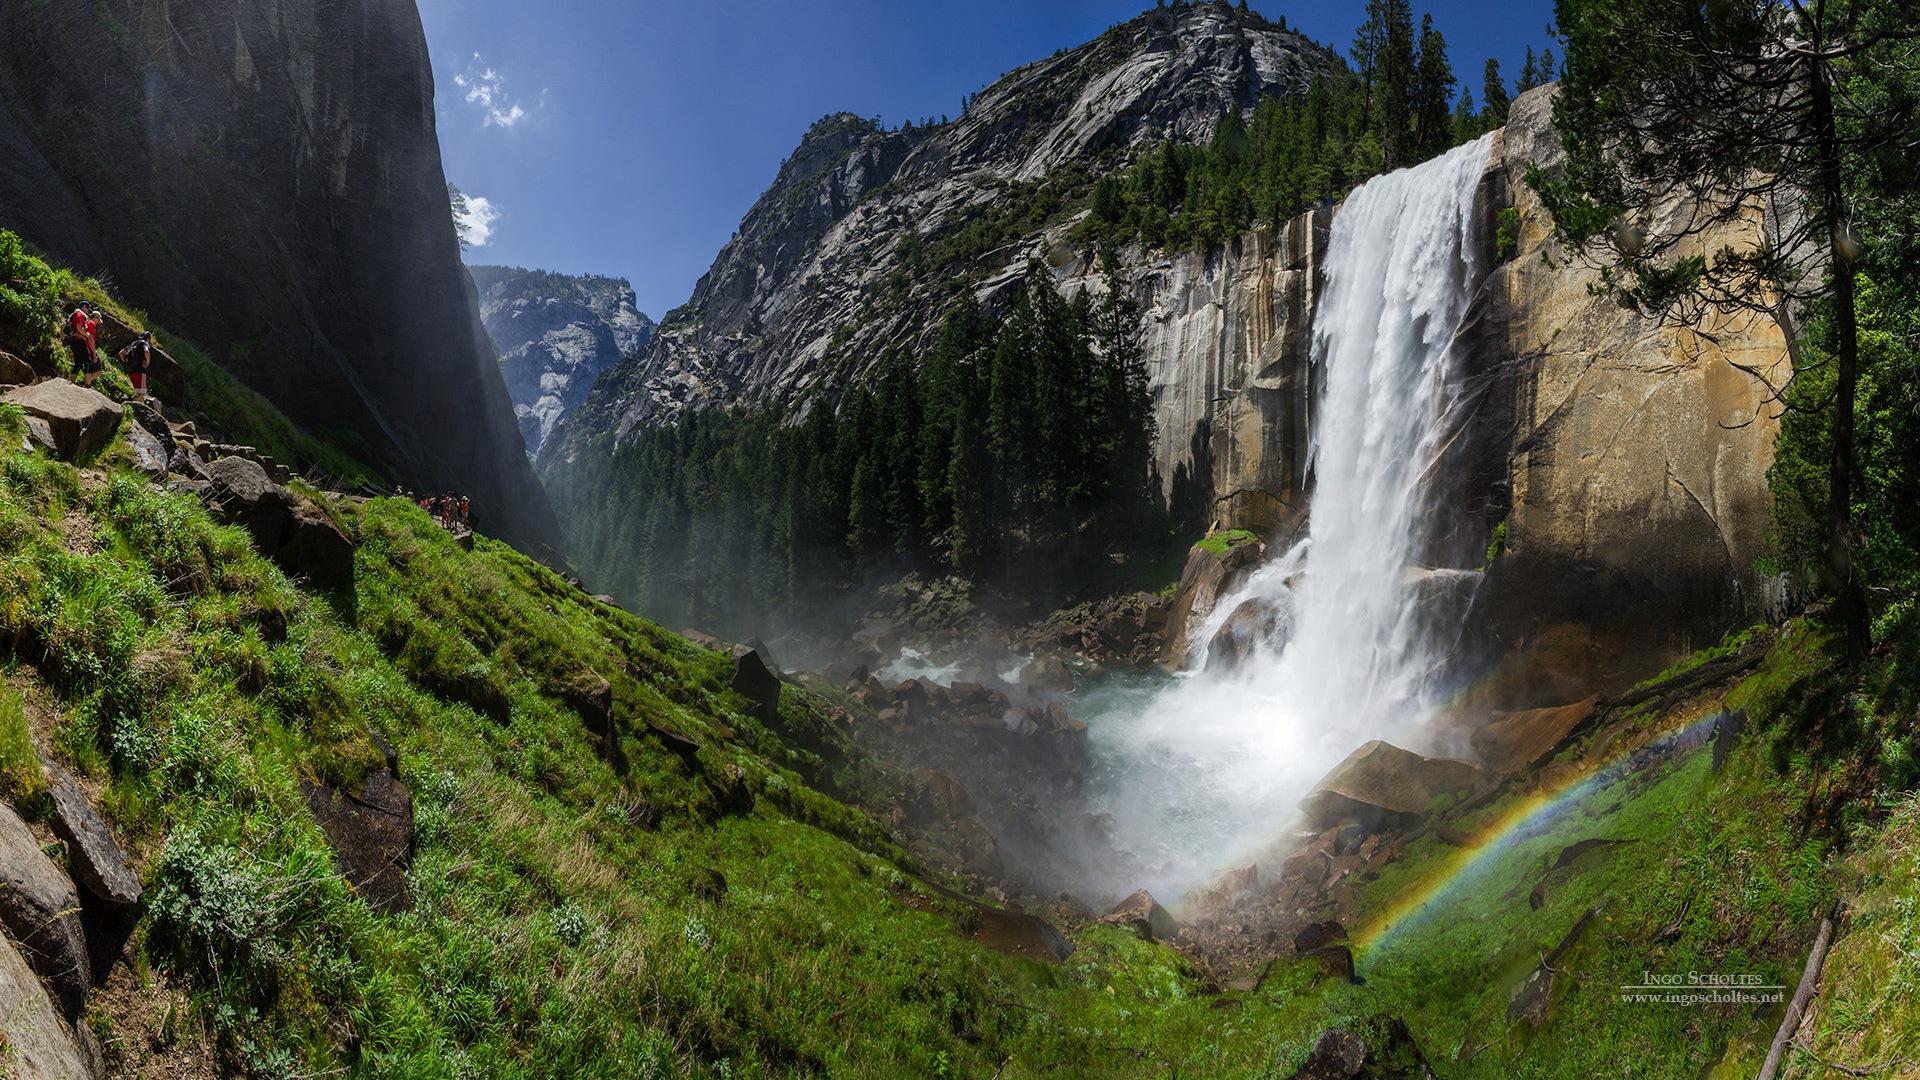 Windows 8 Theme Yosemite National Park Hd Wallpapers 5 1920x1080